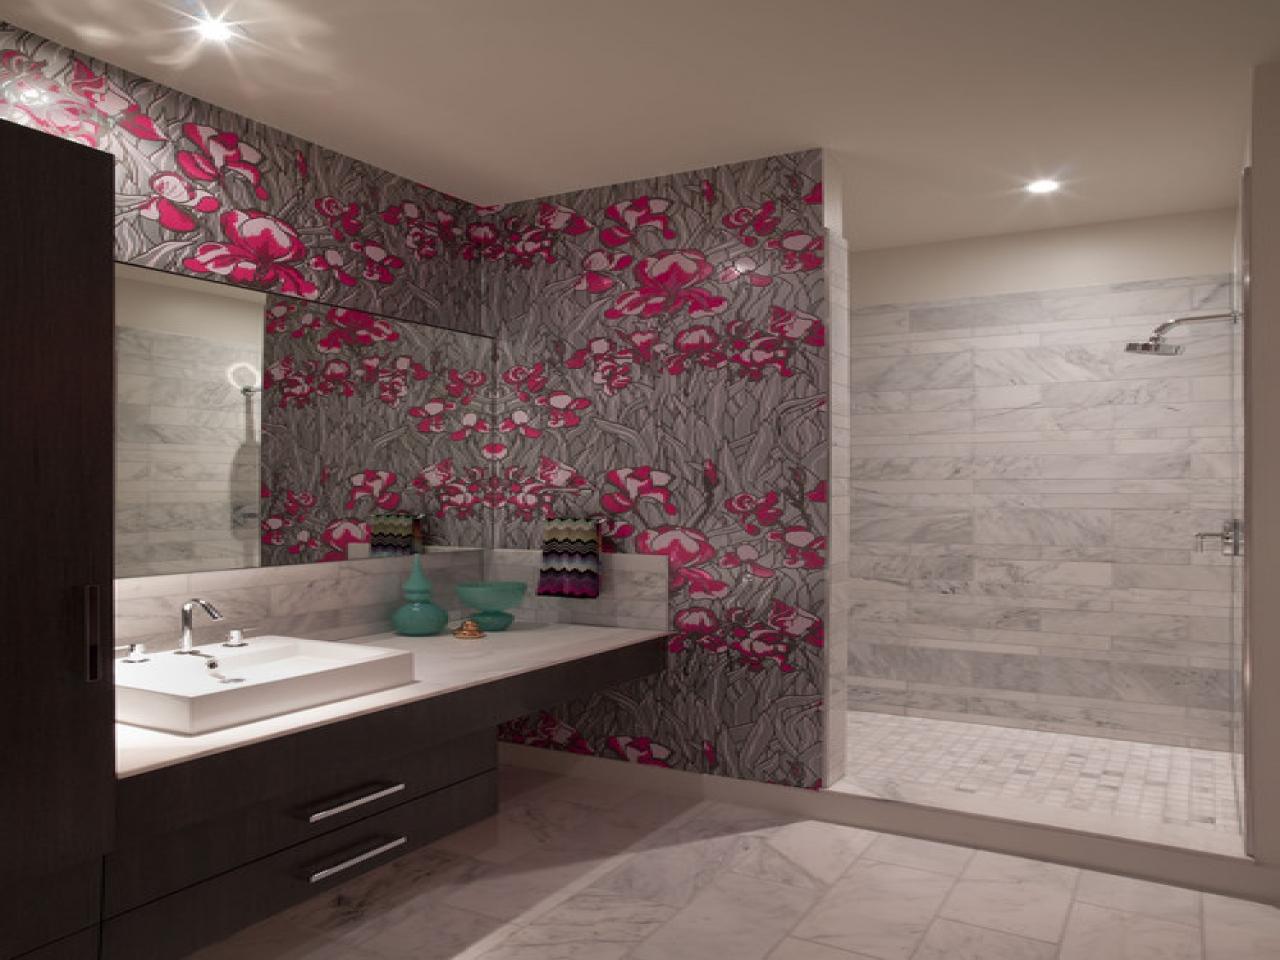 Girly Fashionable Bathroom Wallpaper Modern Ideas - Latest Bathroom Tiles - HD Wallpaper